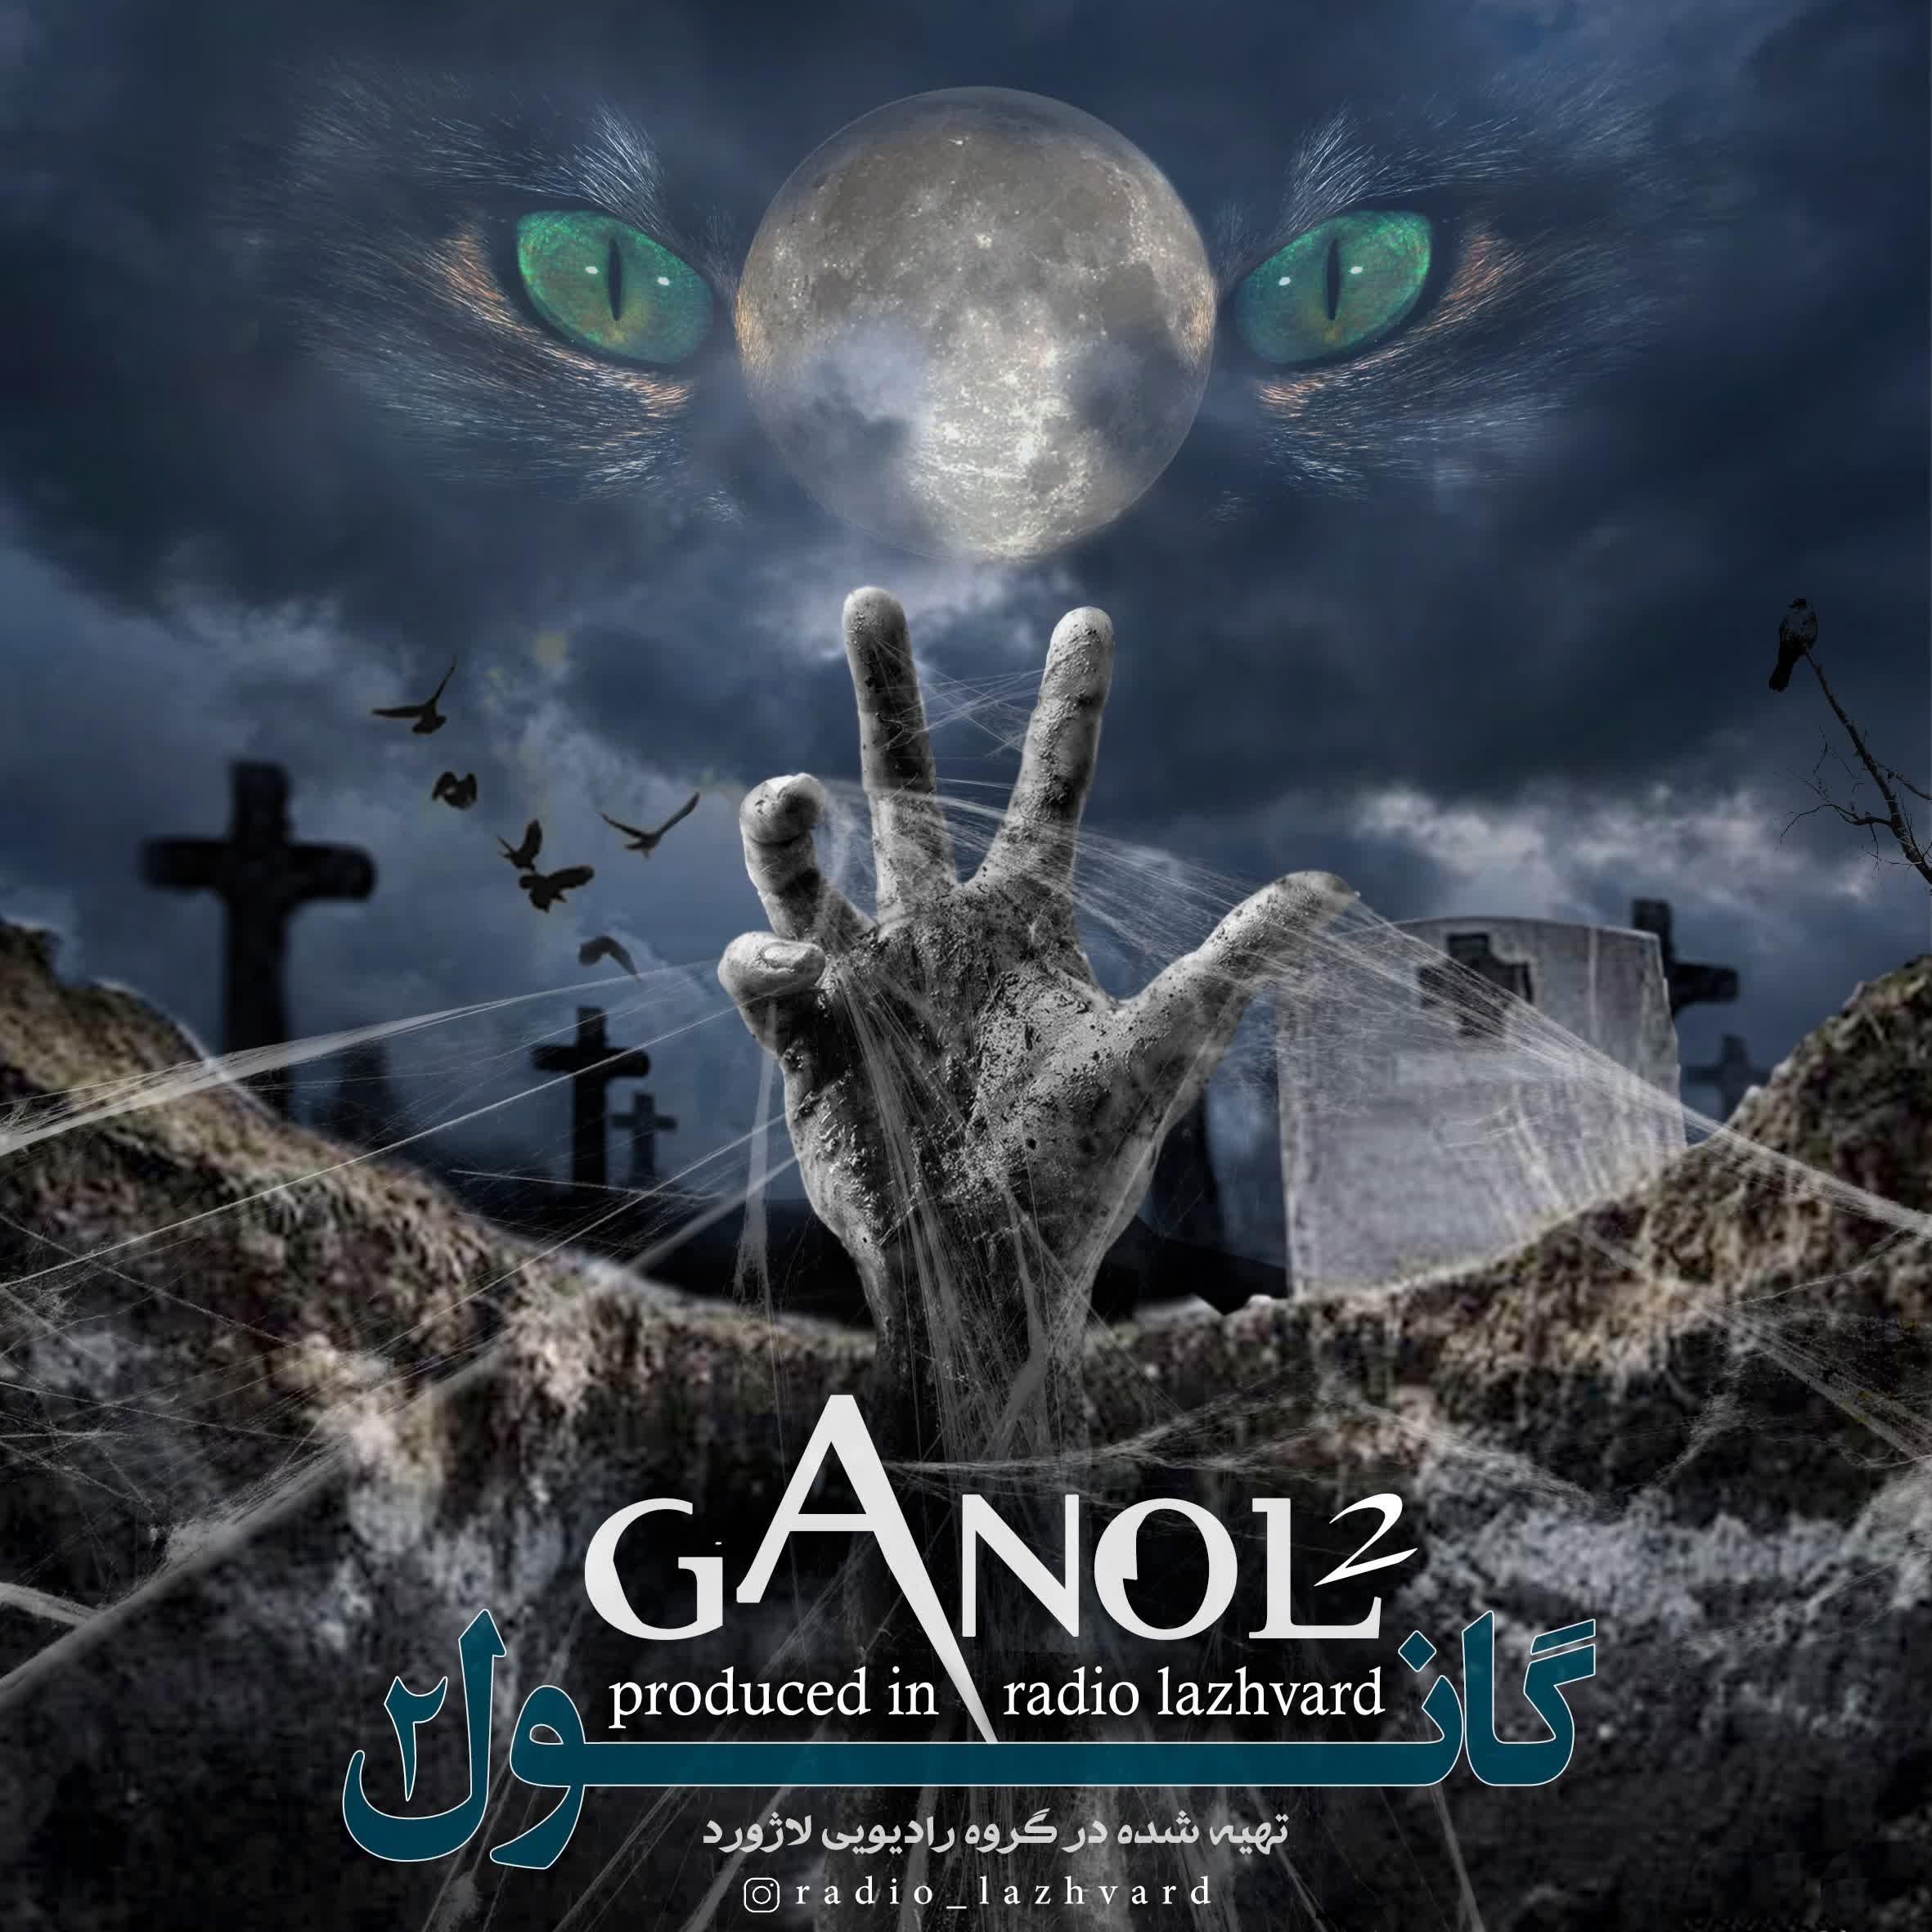 Ganol 2